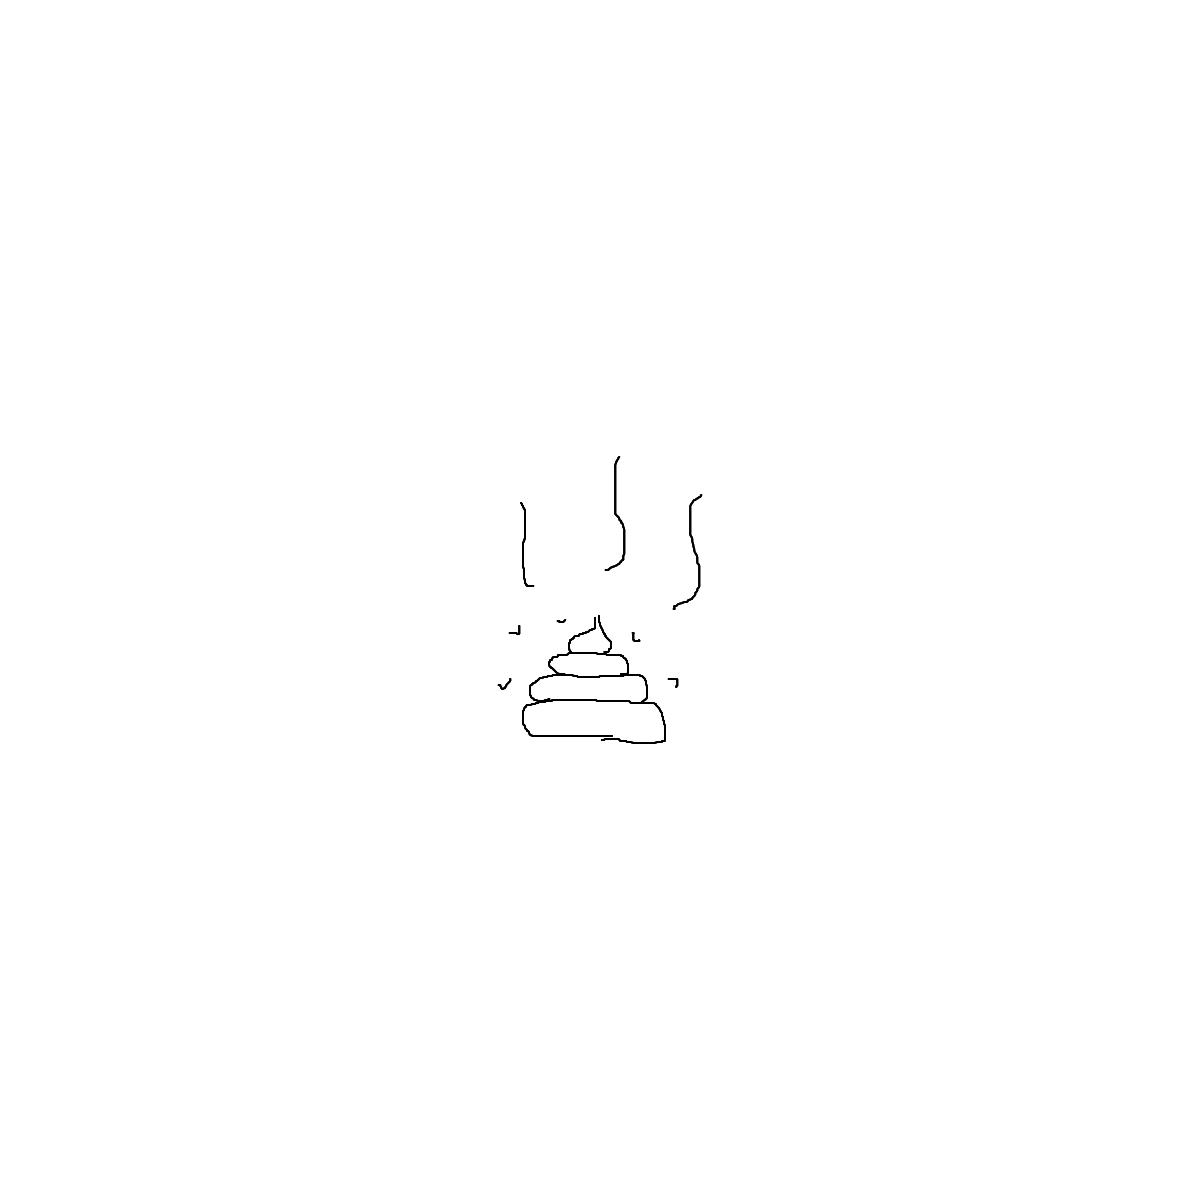 BAAAM drawing#1205 lat:45.5987625122070300lng: 25.4660301208496100